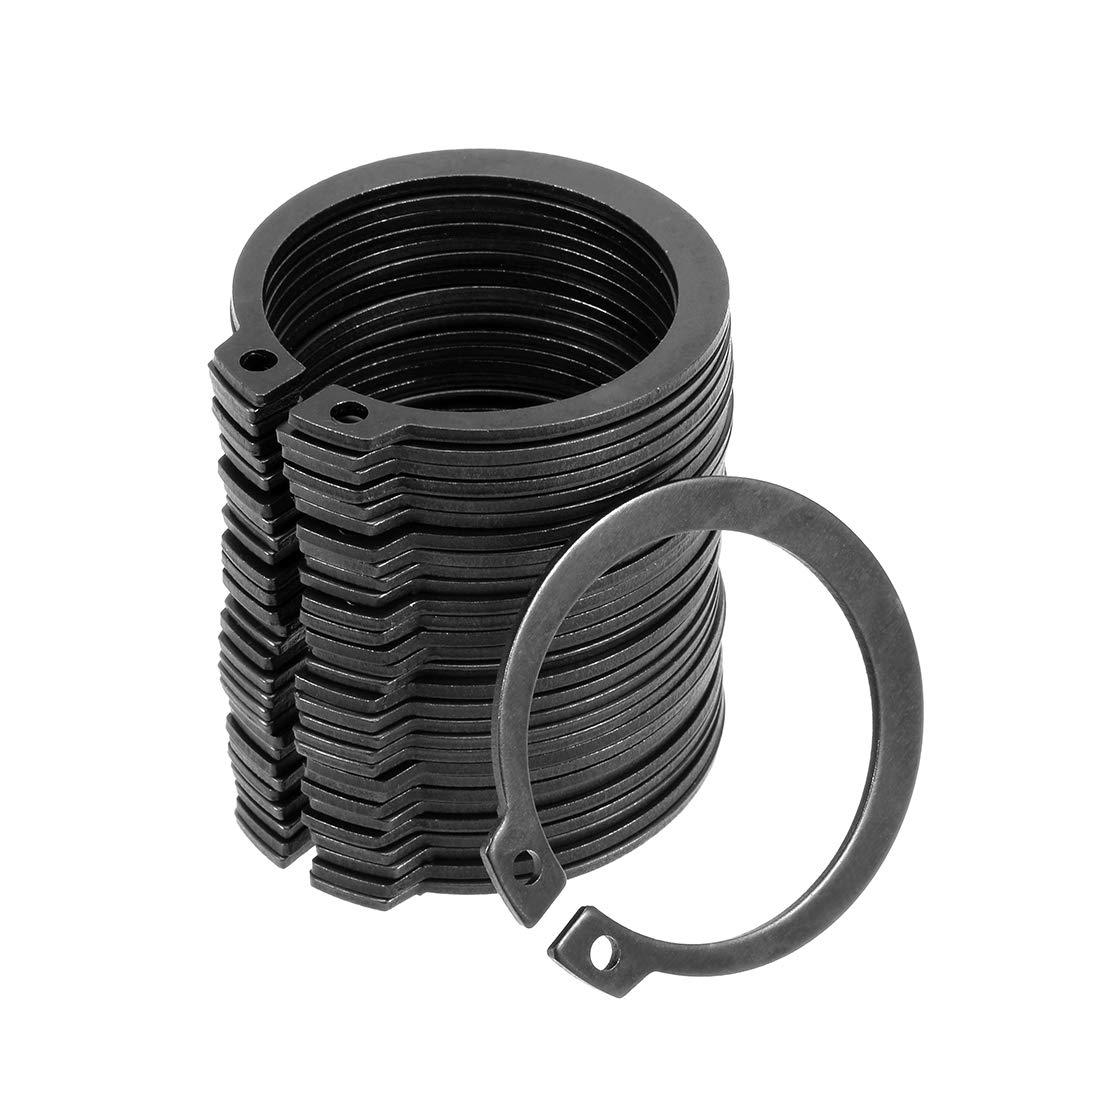 uxcell 42.5mm External Circlips C-Clip Ring mart Shaft Snap El Paso Mall Retaining